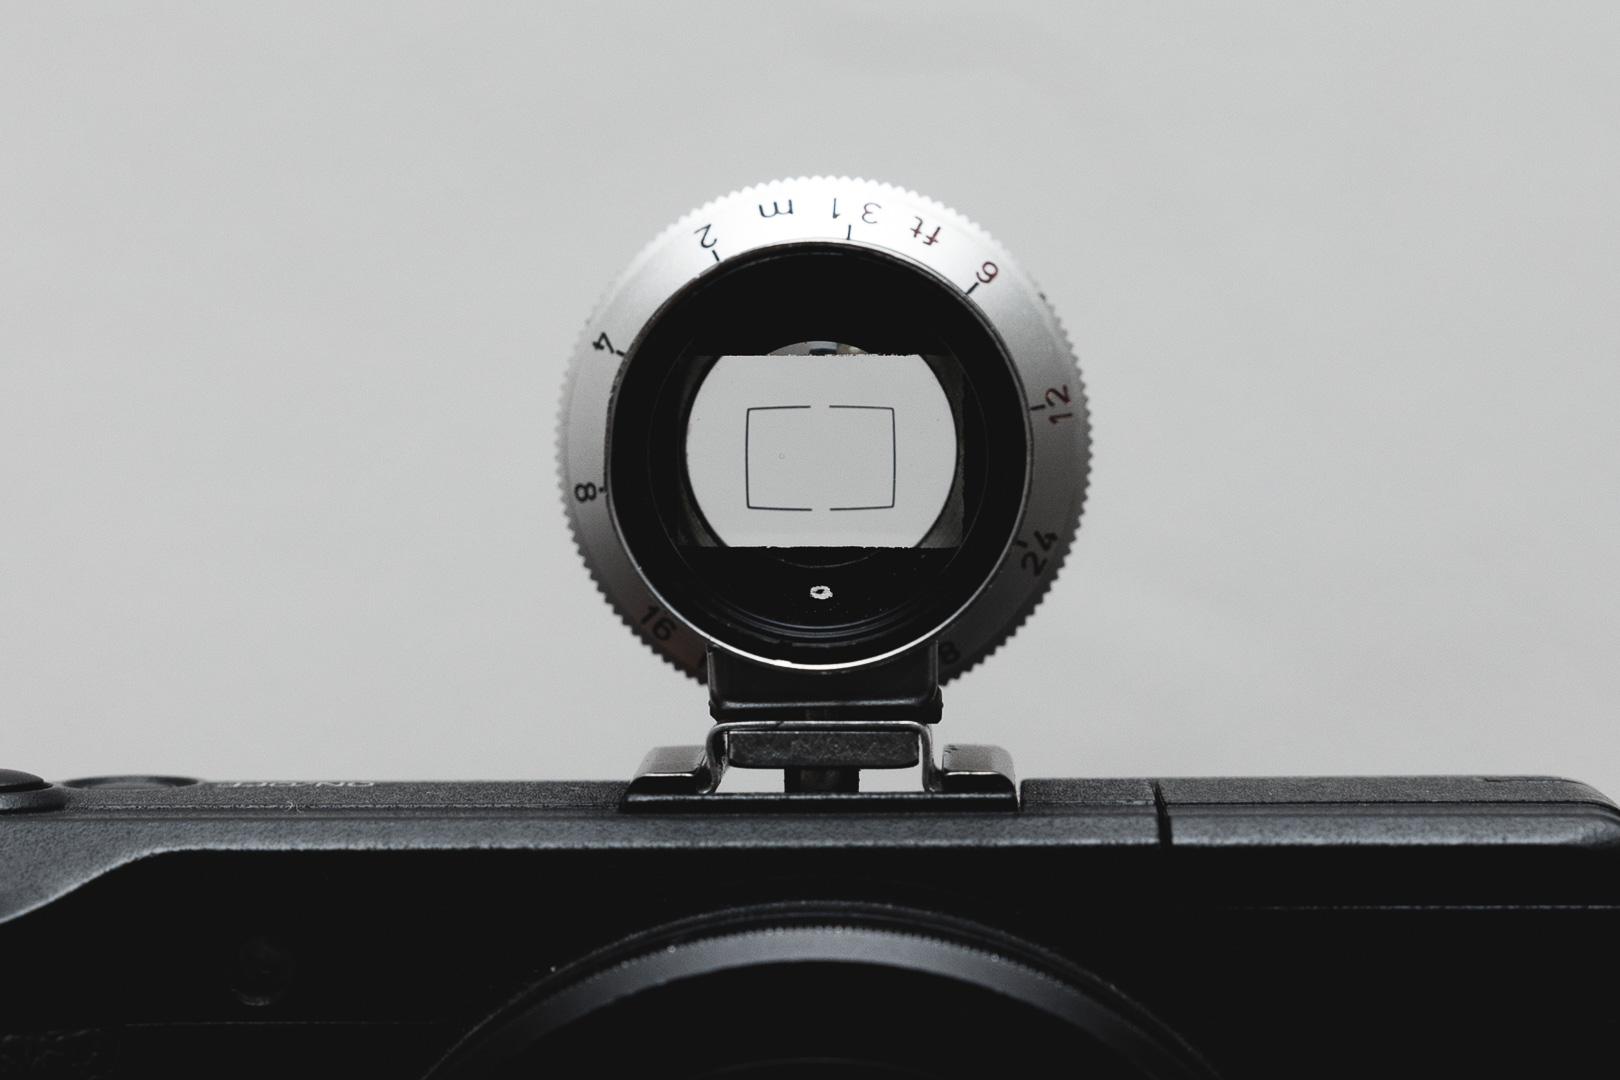 Diax-35mm-finder-Ant Tran-20170402-2977.jpg